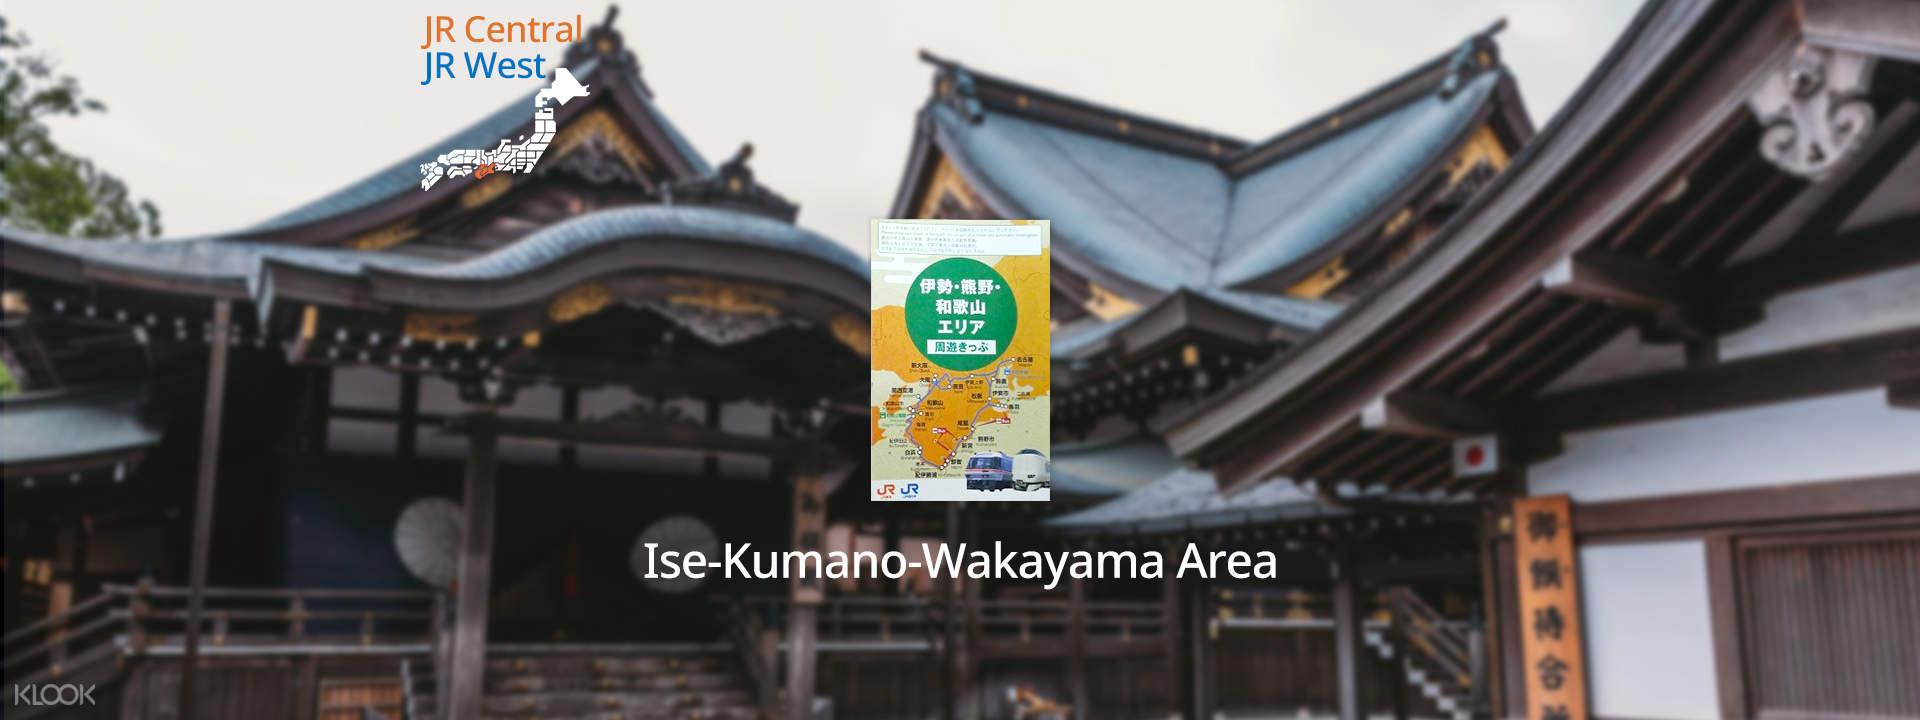 5 Day JR Osaka - Nagoya 'Ise-Kumano-Wakayama Area Tourist